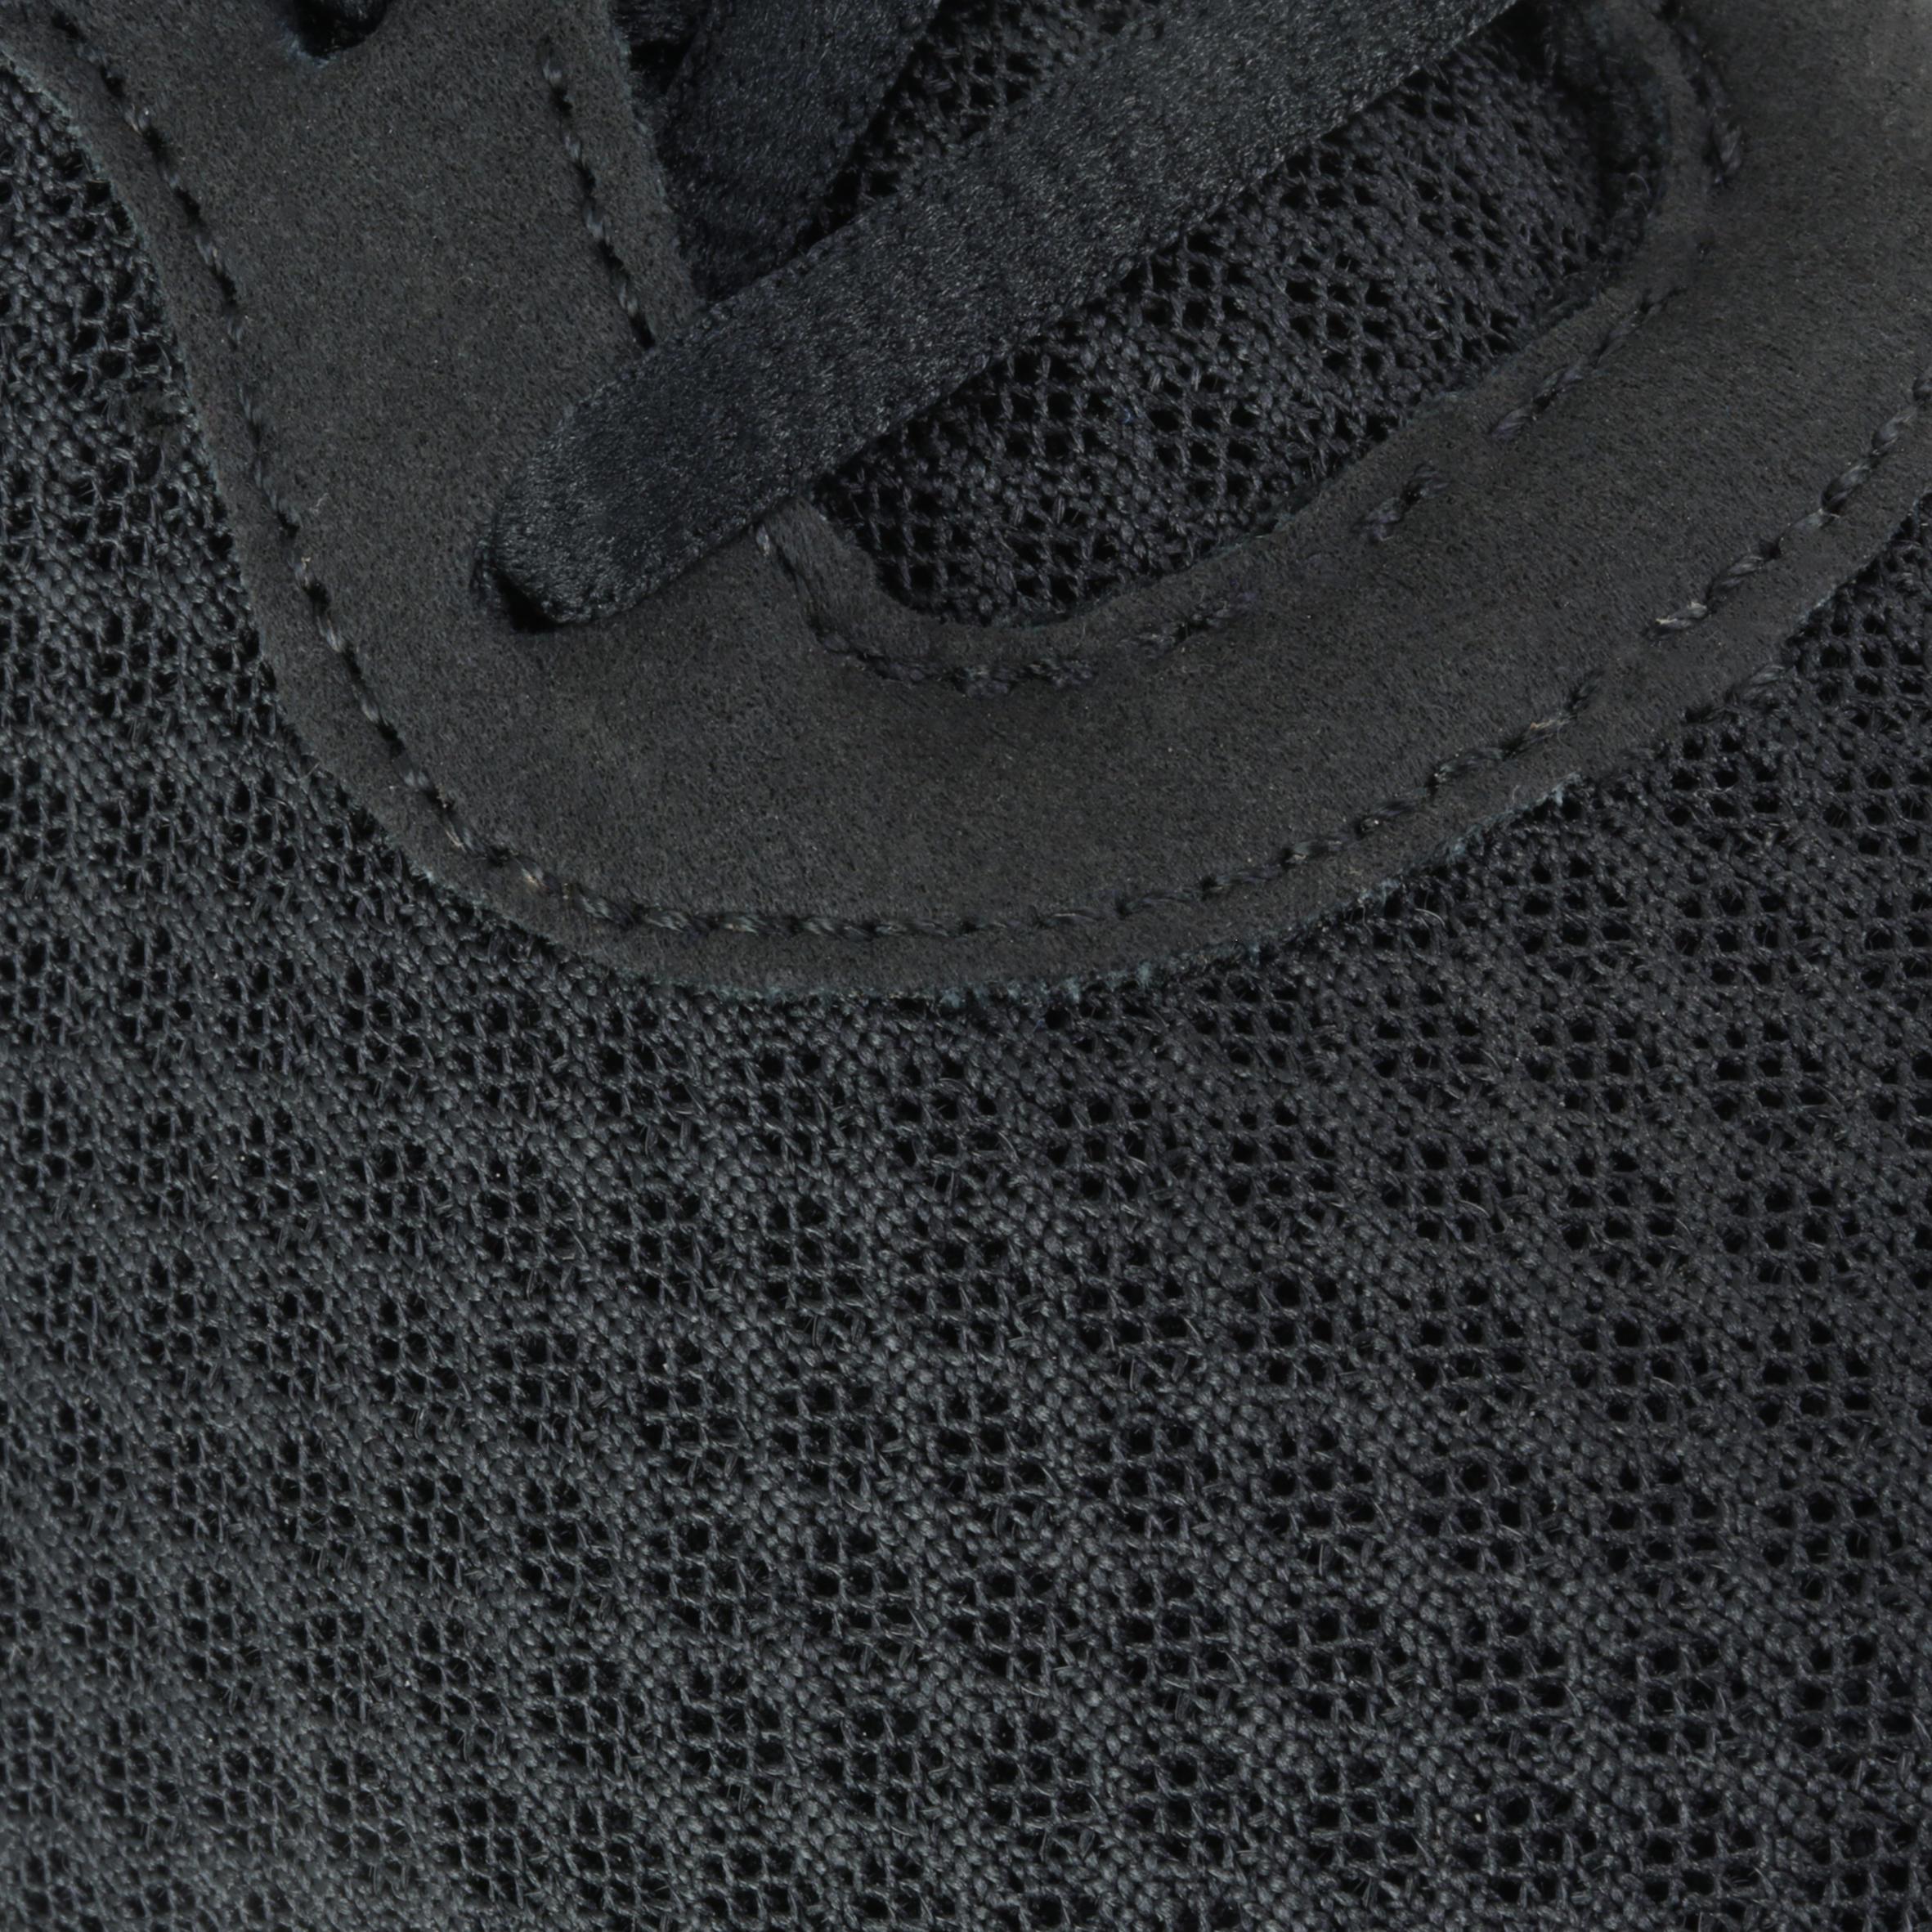 Tanjun Chaussures Blanc Homme Marche Sportive Noir v0wOymN8nP